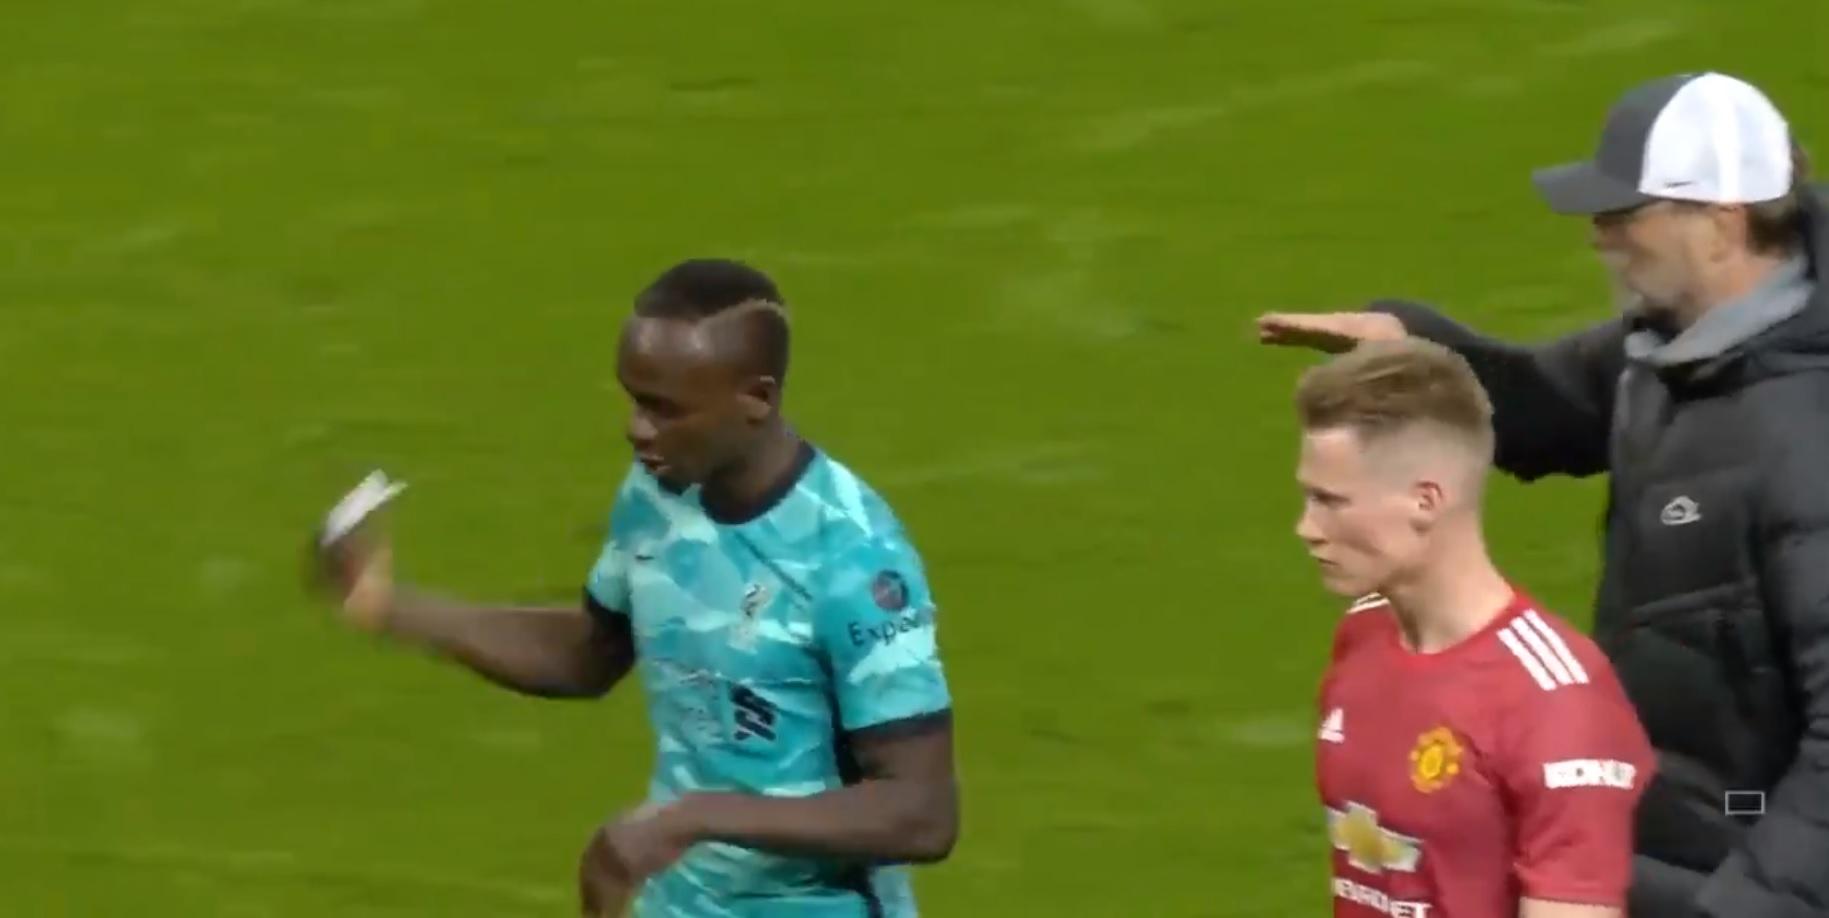 Sadio Mane showed 'lack of respect' after United victory, says Michael Owen